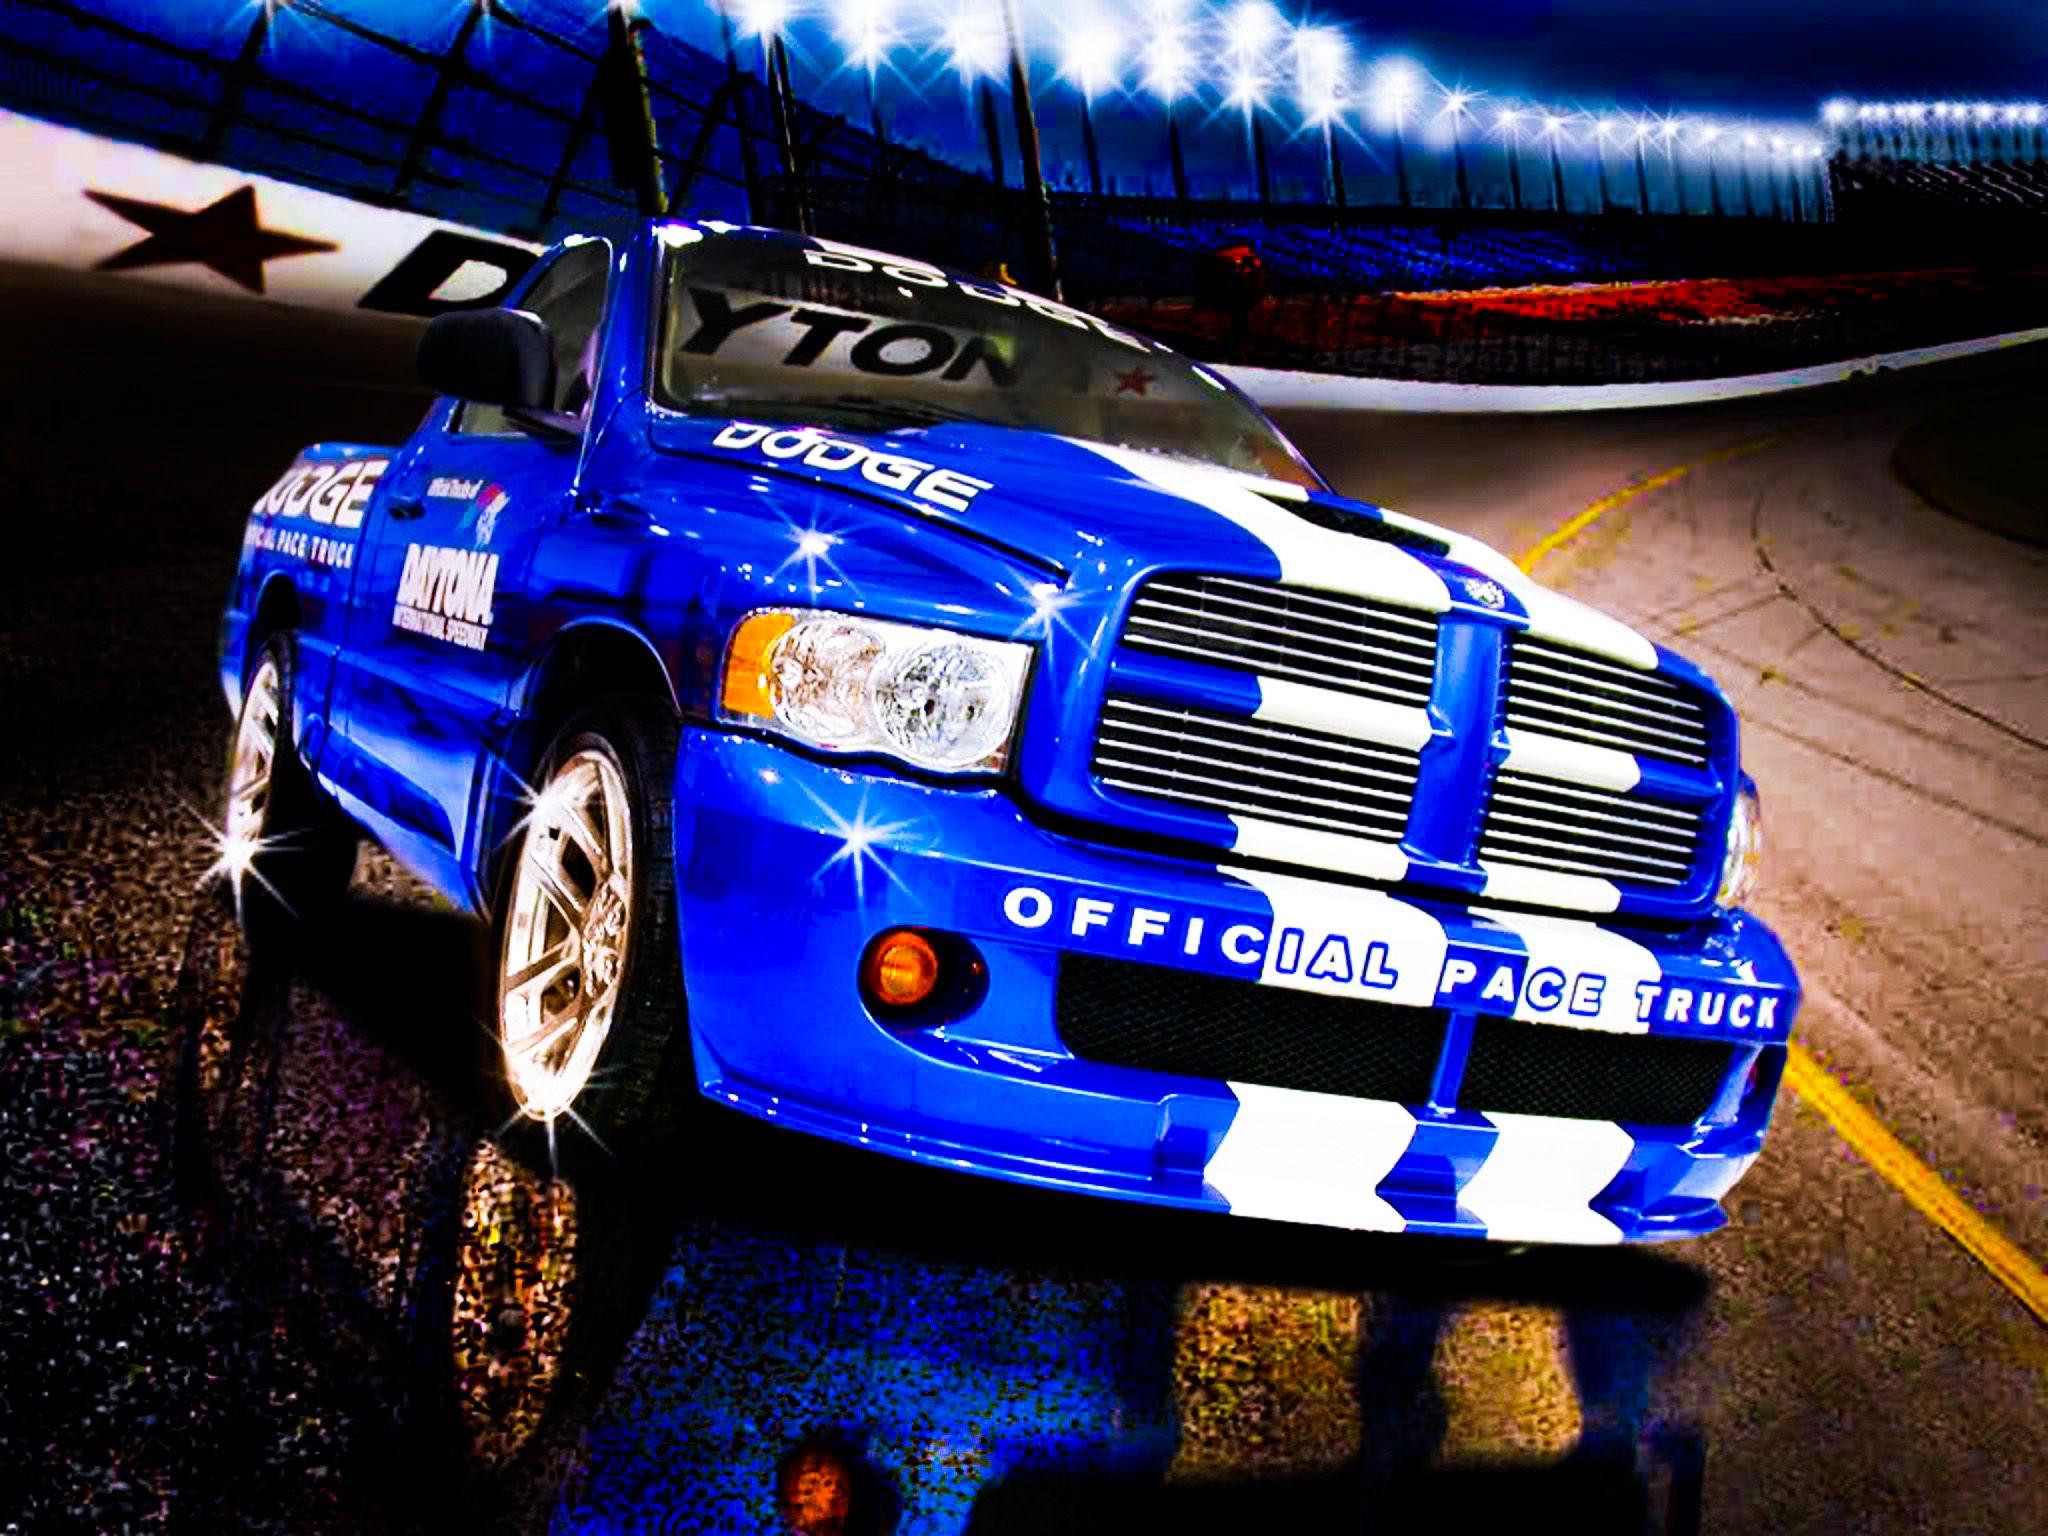 Viper Car Alarm Wiring Diagram 03 Dodge Ram 1500 Schematic Diagrams 92 Camaro Circuit